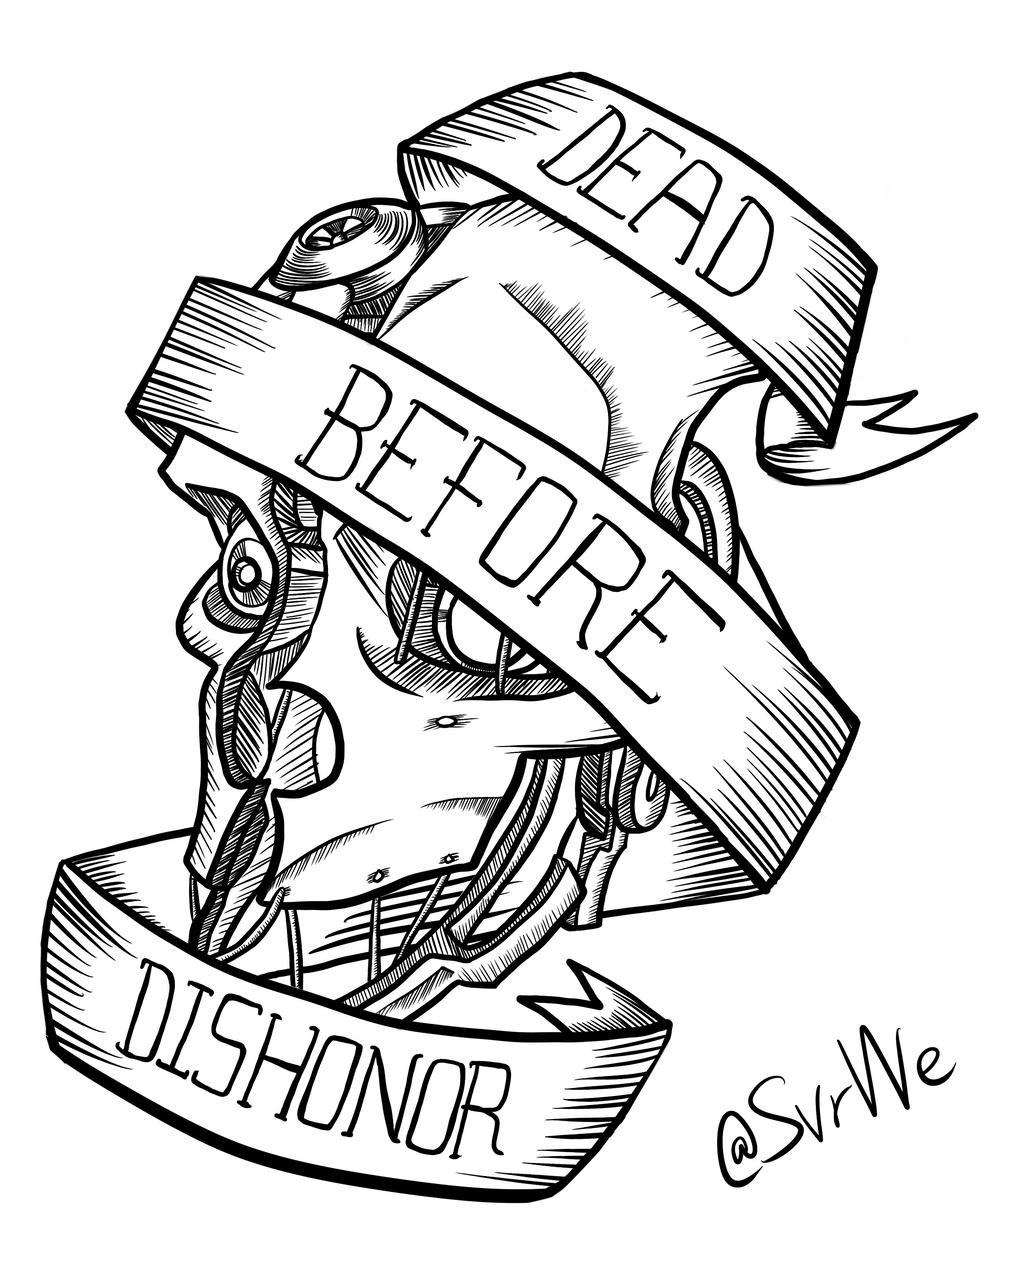 dishonored tattoo by sebastengentopero on deviantart. Black Bedroom Furniture Sets. Home Design Ideas